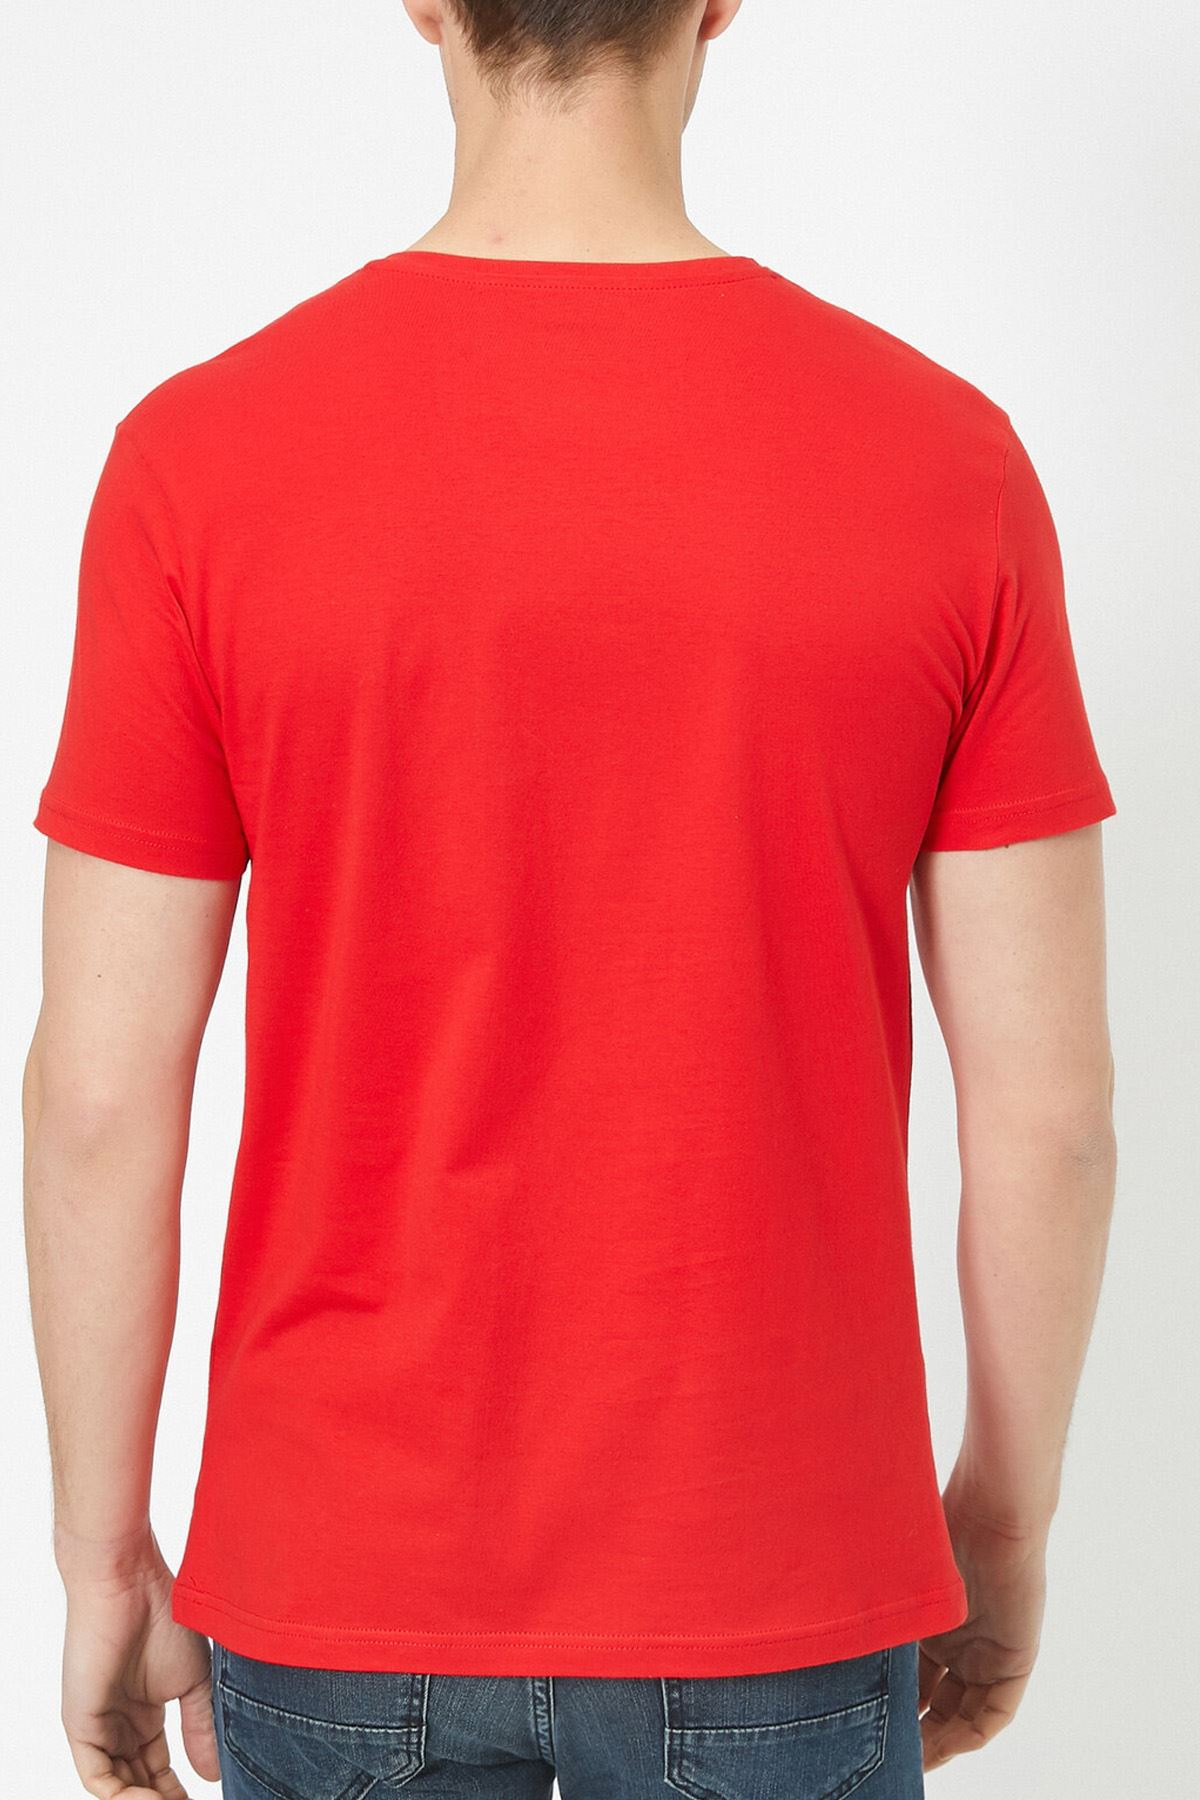 Naruto Anime 11 Kırmızı Erkek Tshirt - Tişört